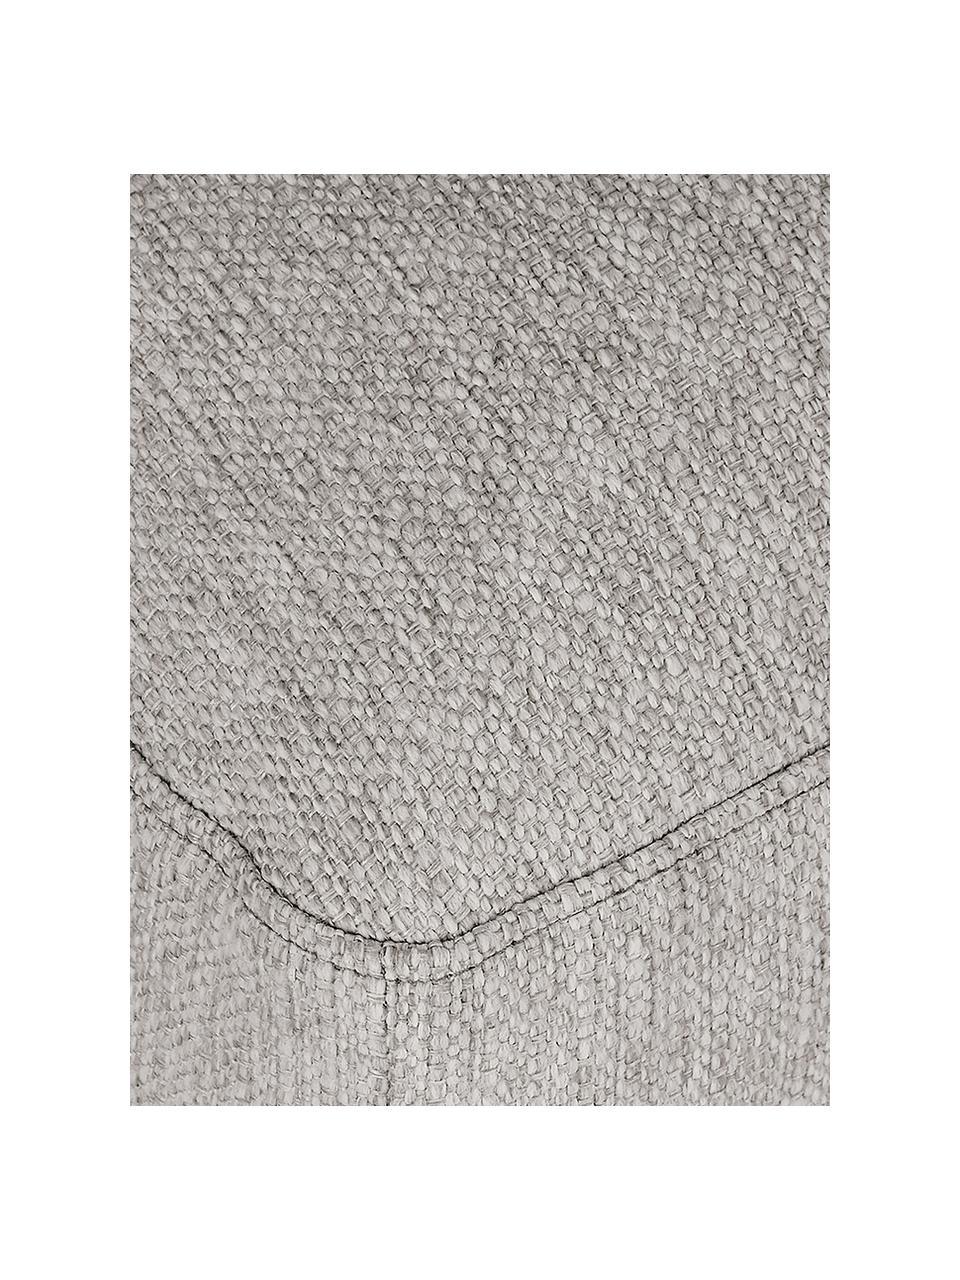 Sofa-Hocker Tribeca in Beigegrau, Bezug: Polyester Der hochwertige, Gestell: Massives Kiefernholz, Füße: Massives Buchenholz, lack, Webstoff Beigegrau, 80 x 40 cm